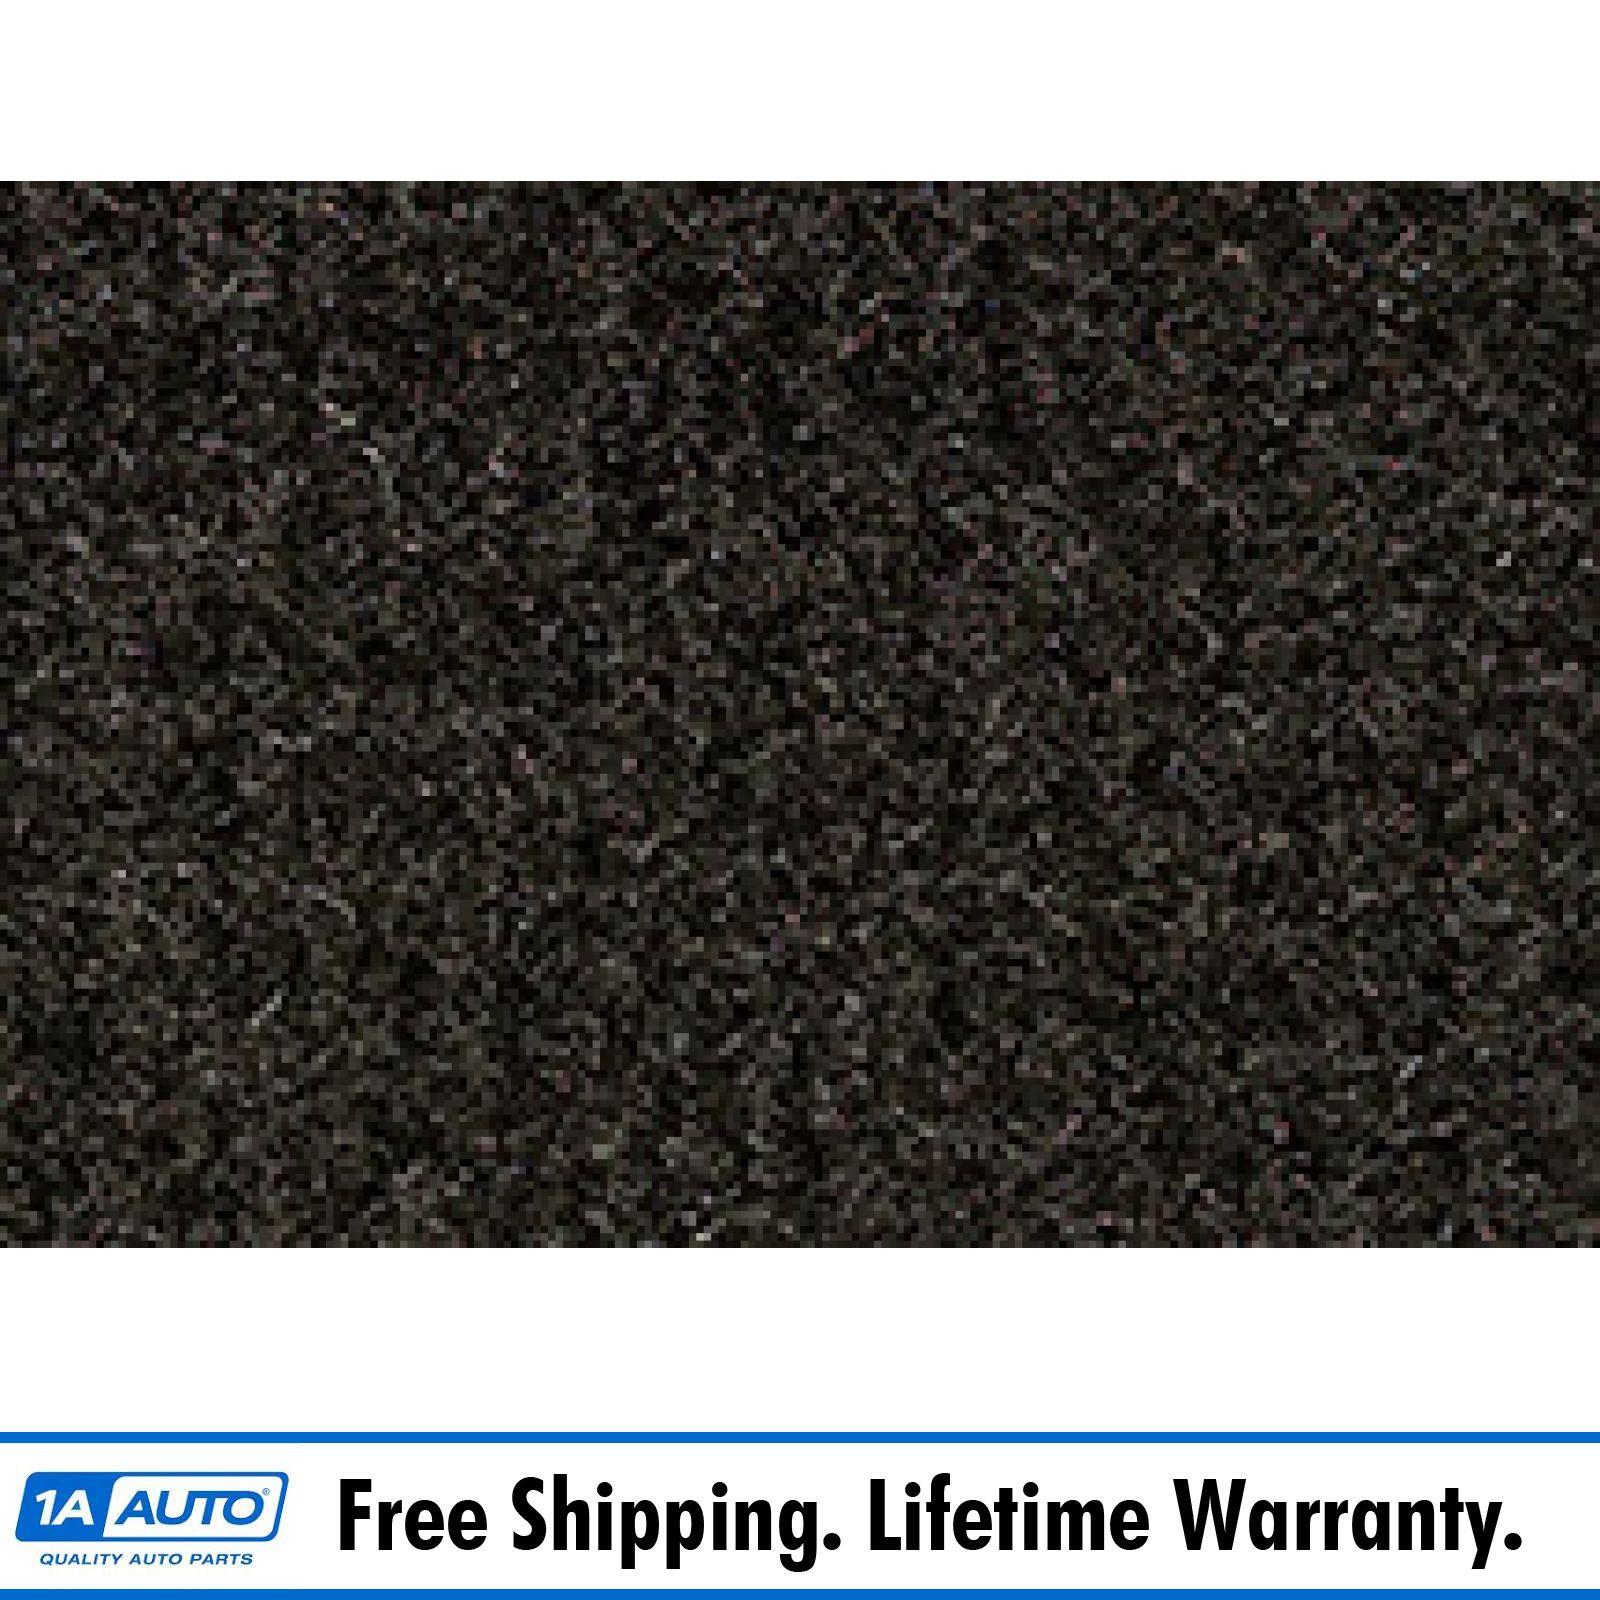 67-72 Chevy//GMC K10 4WD Truck Custom Molded Cutpile Black Carpet Kit Made in USA